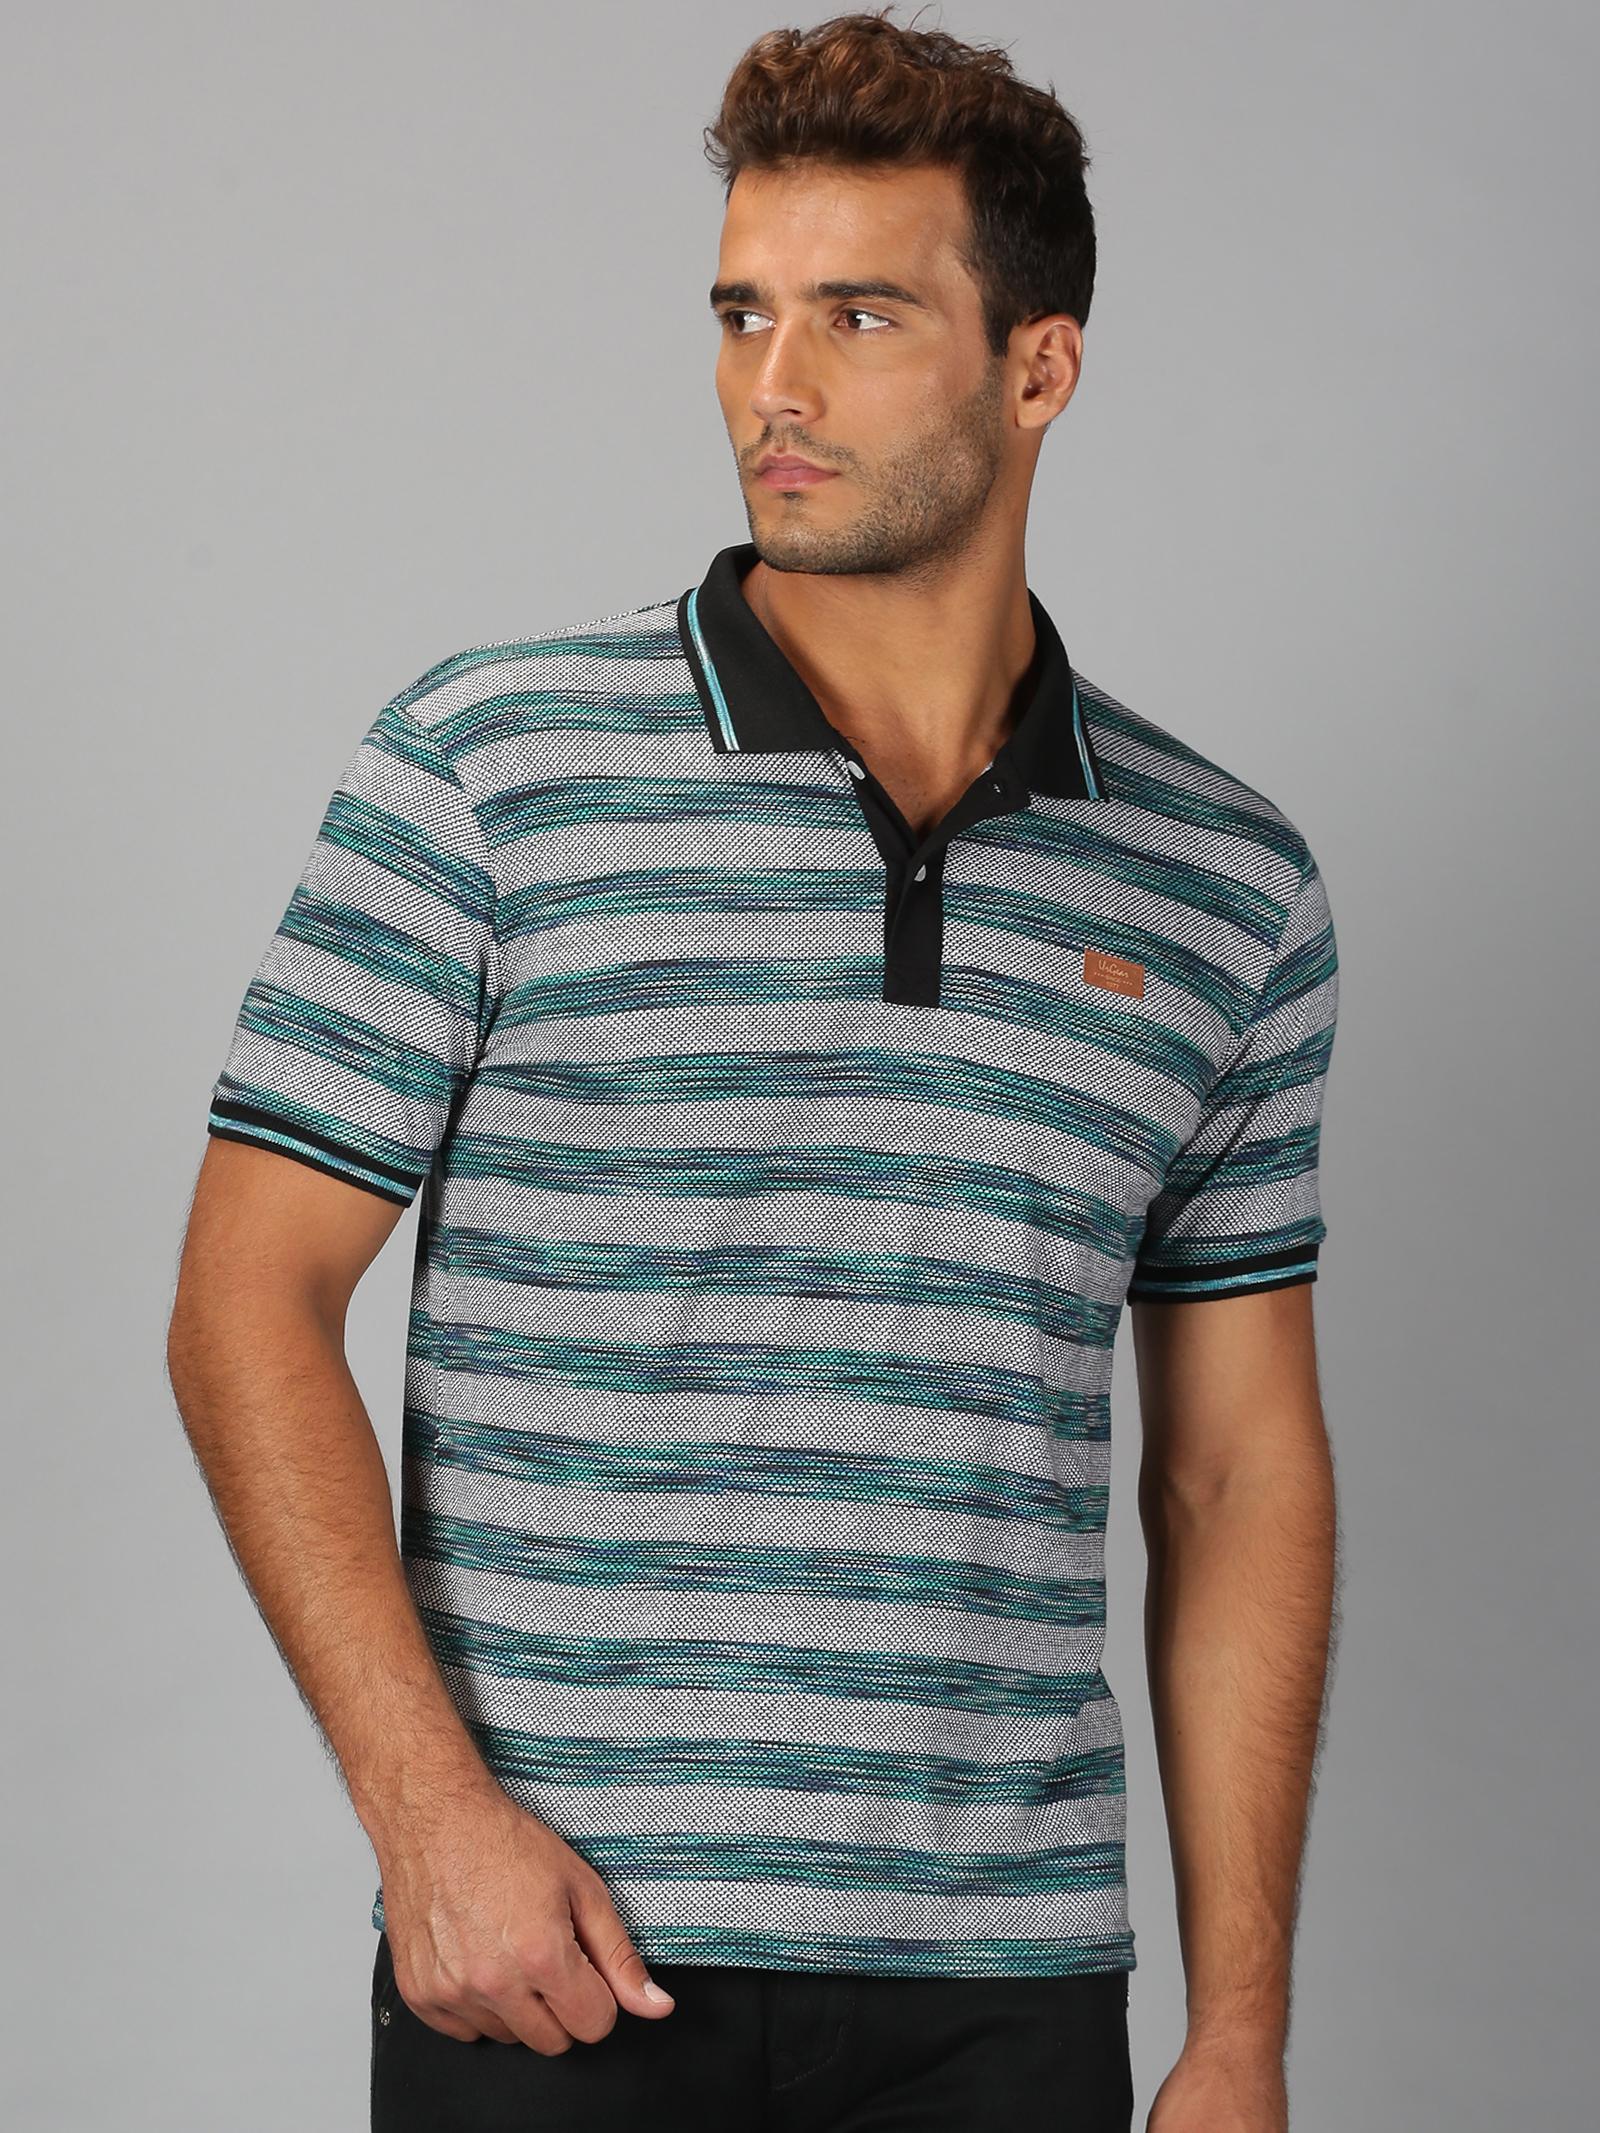 UrGear | Mens Polo Neck Striped Green White T-Shirt